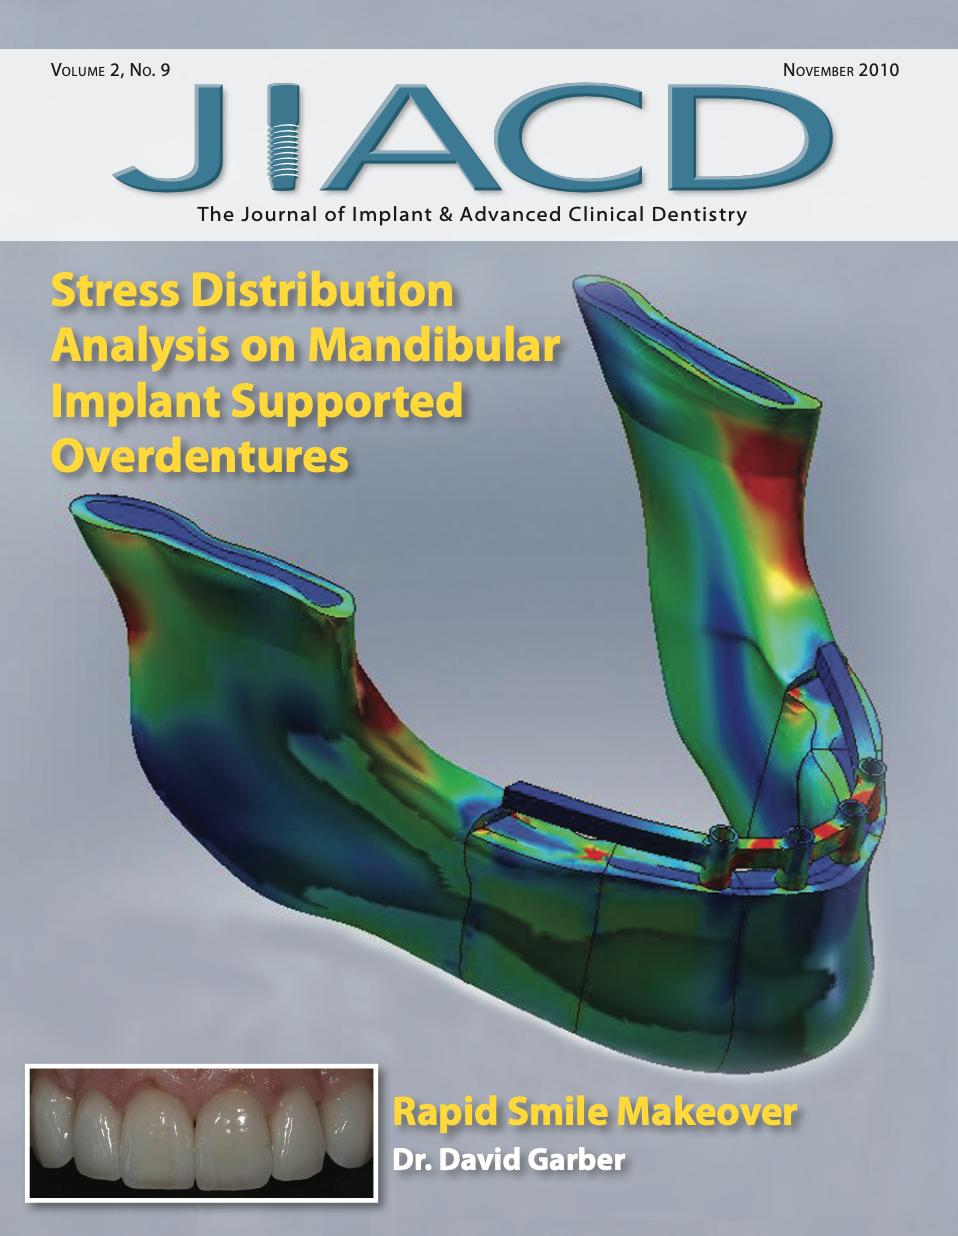 Stress Distribution Analysis on Mandibular Implant Supported Overdentures